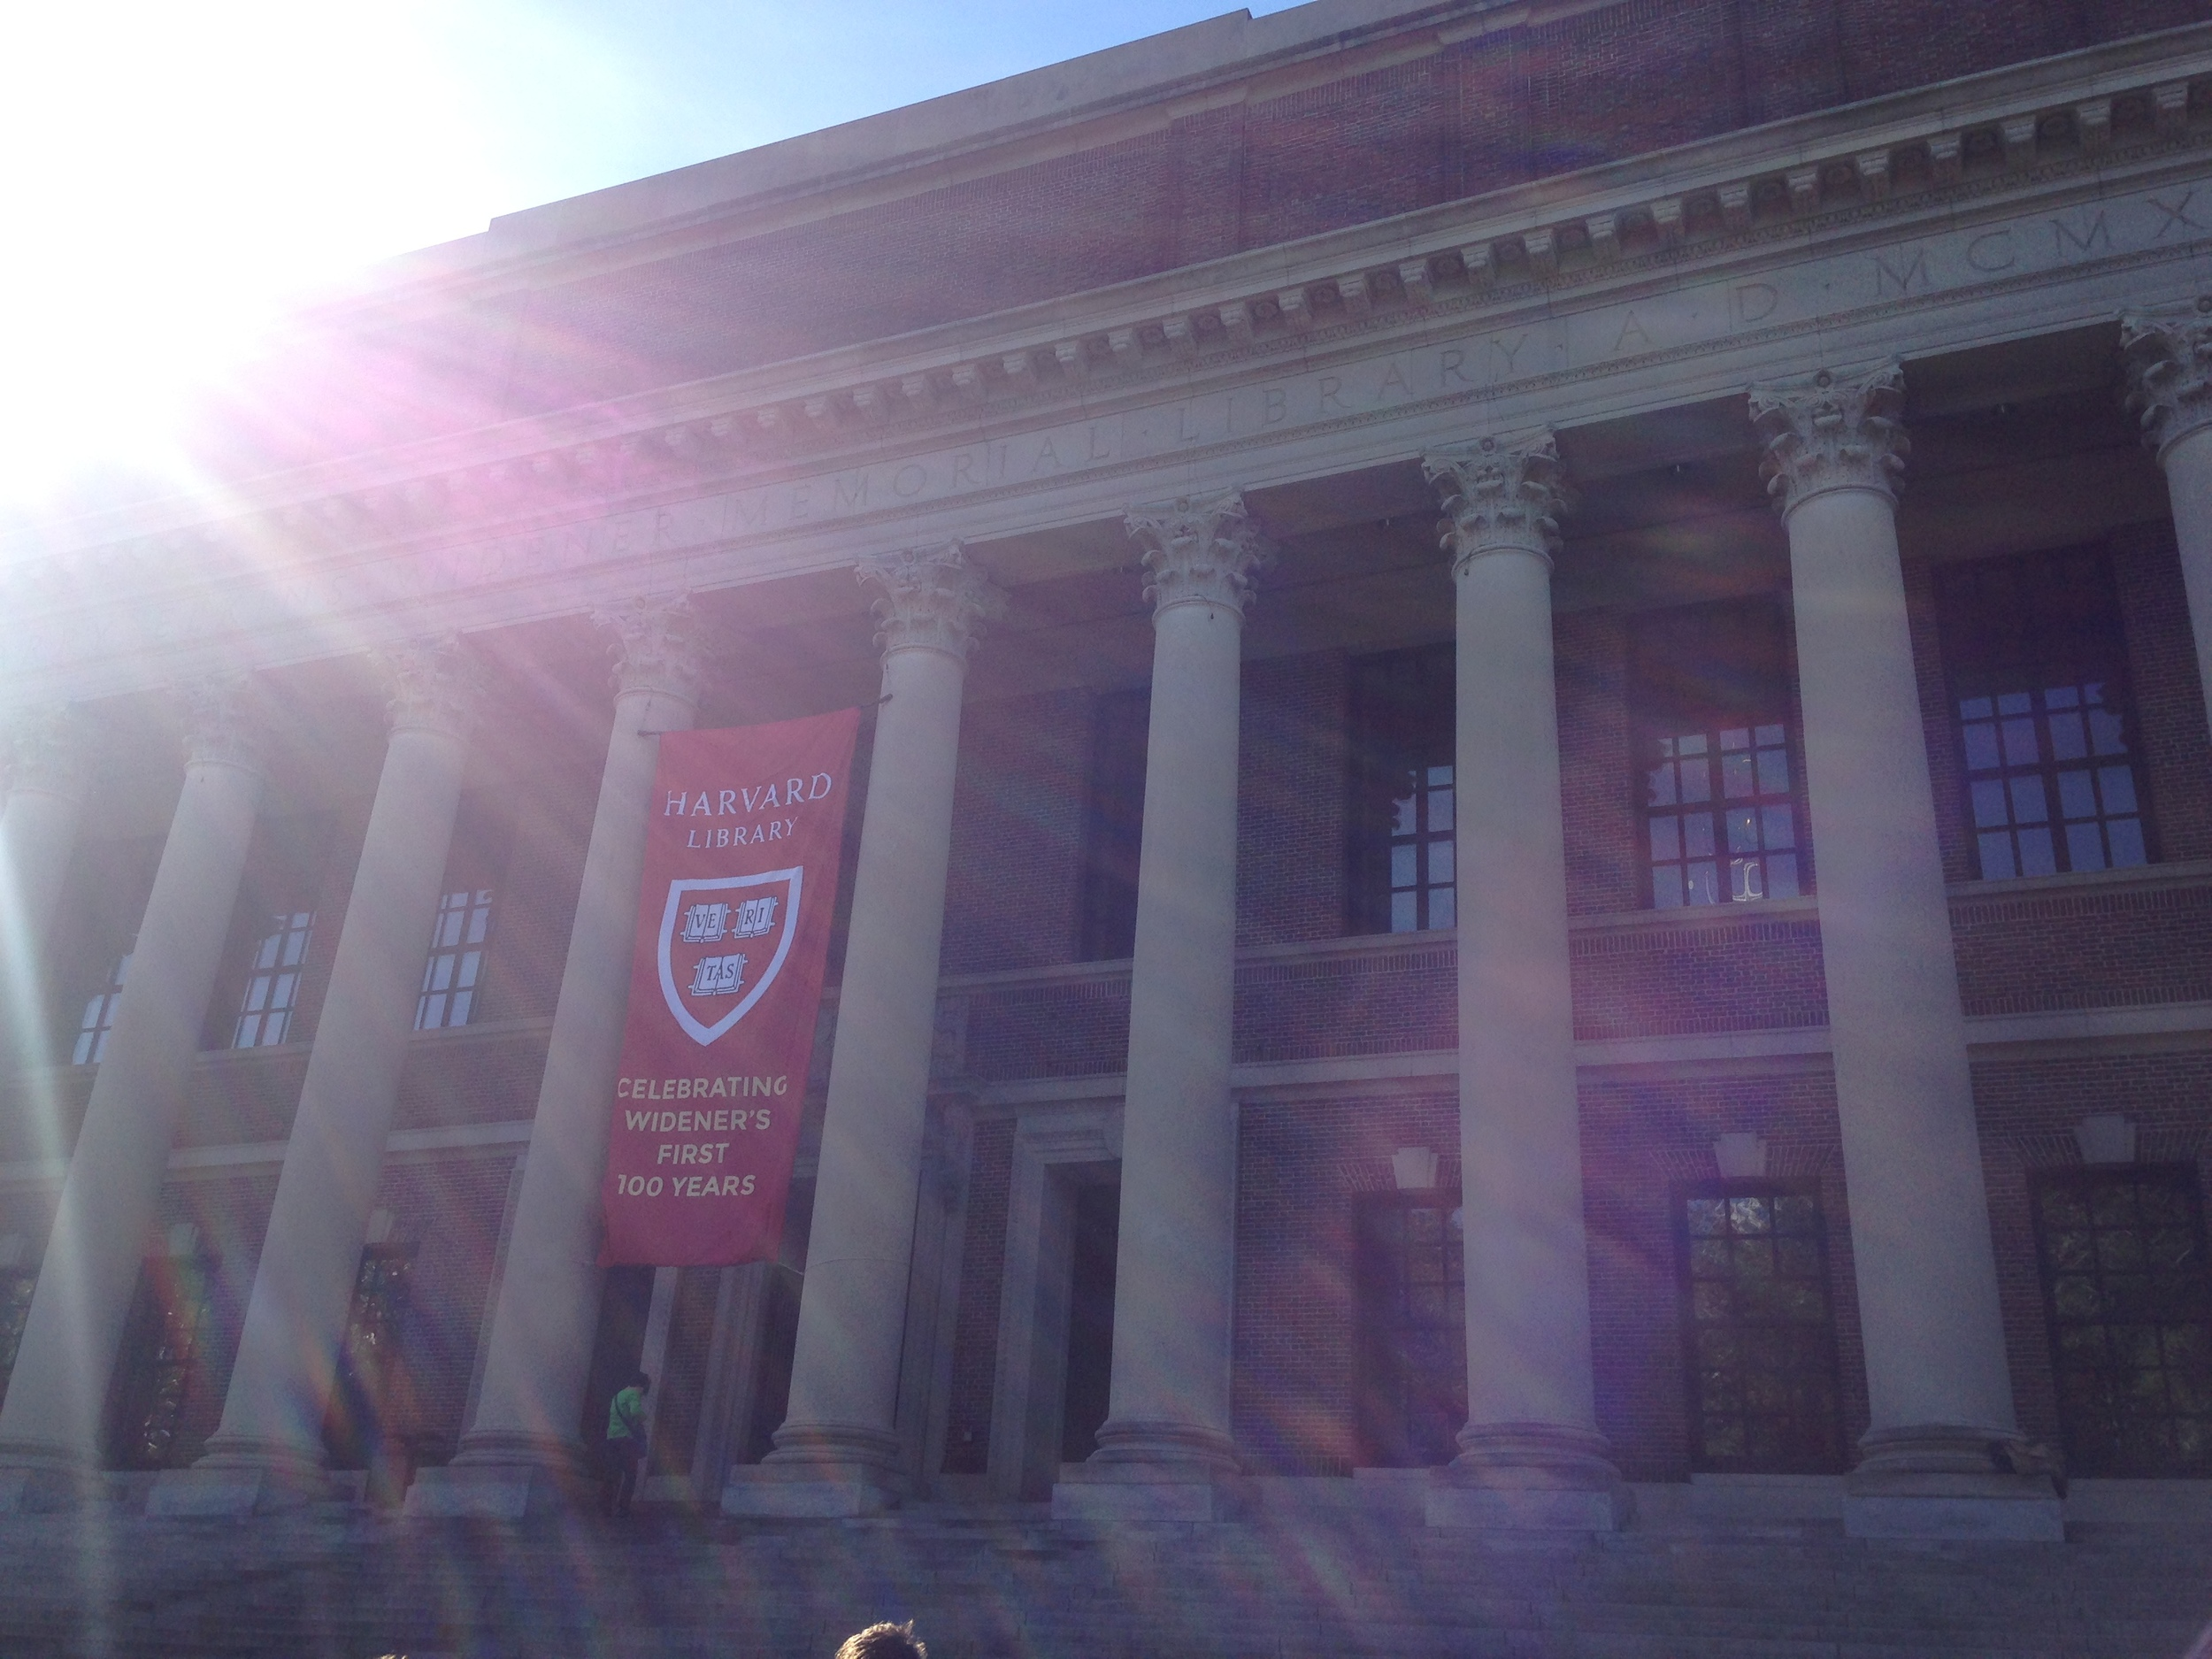 HarvardLibrary.JPG